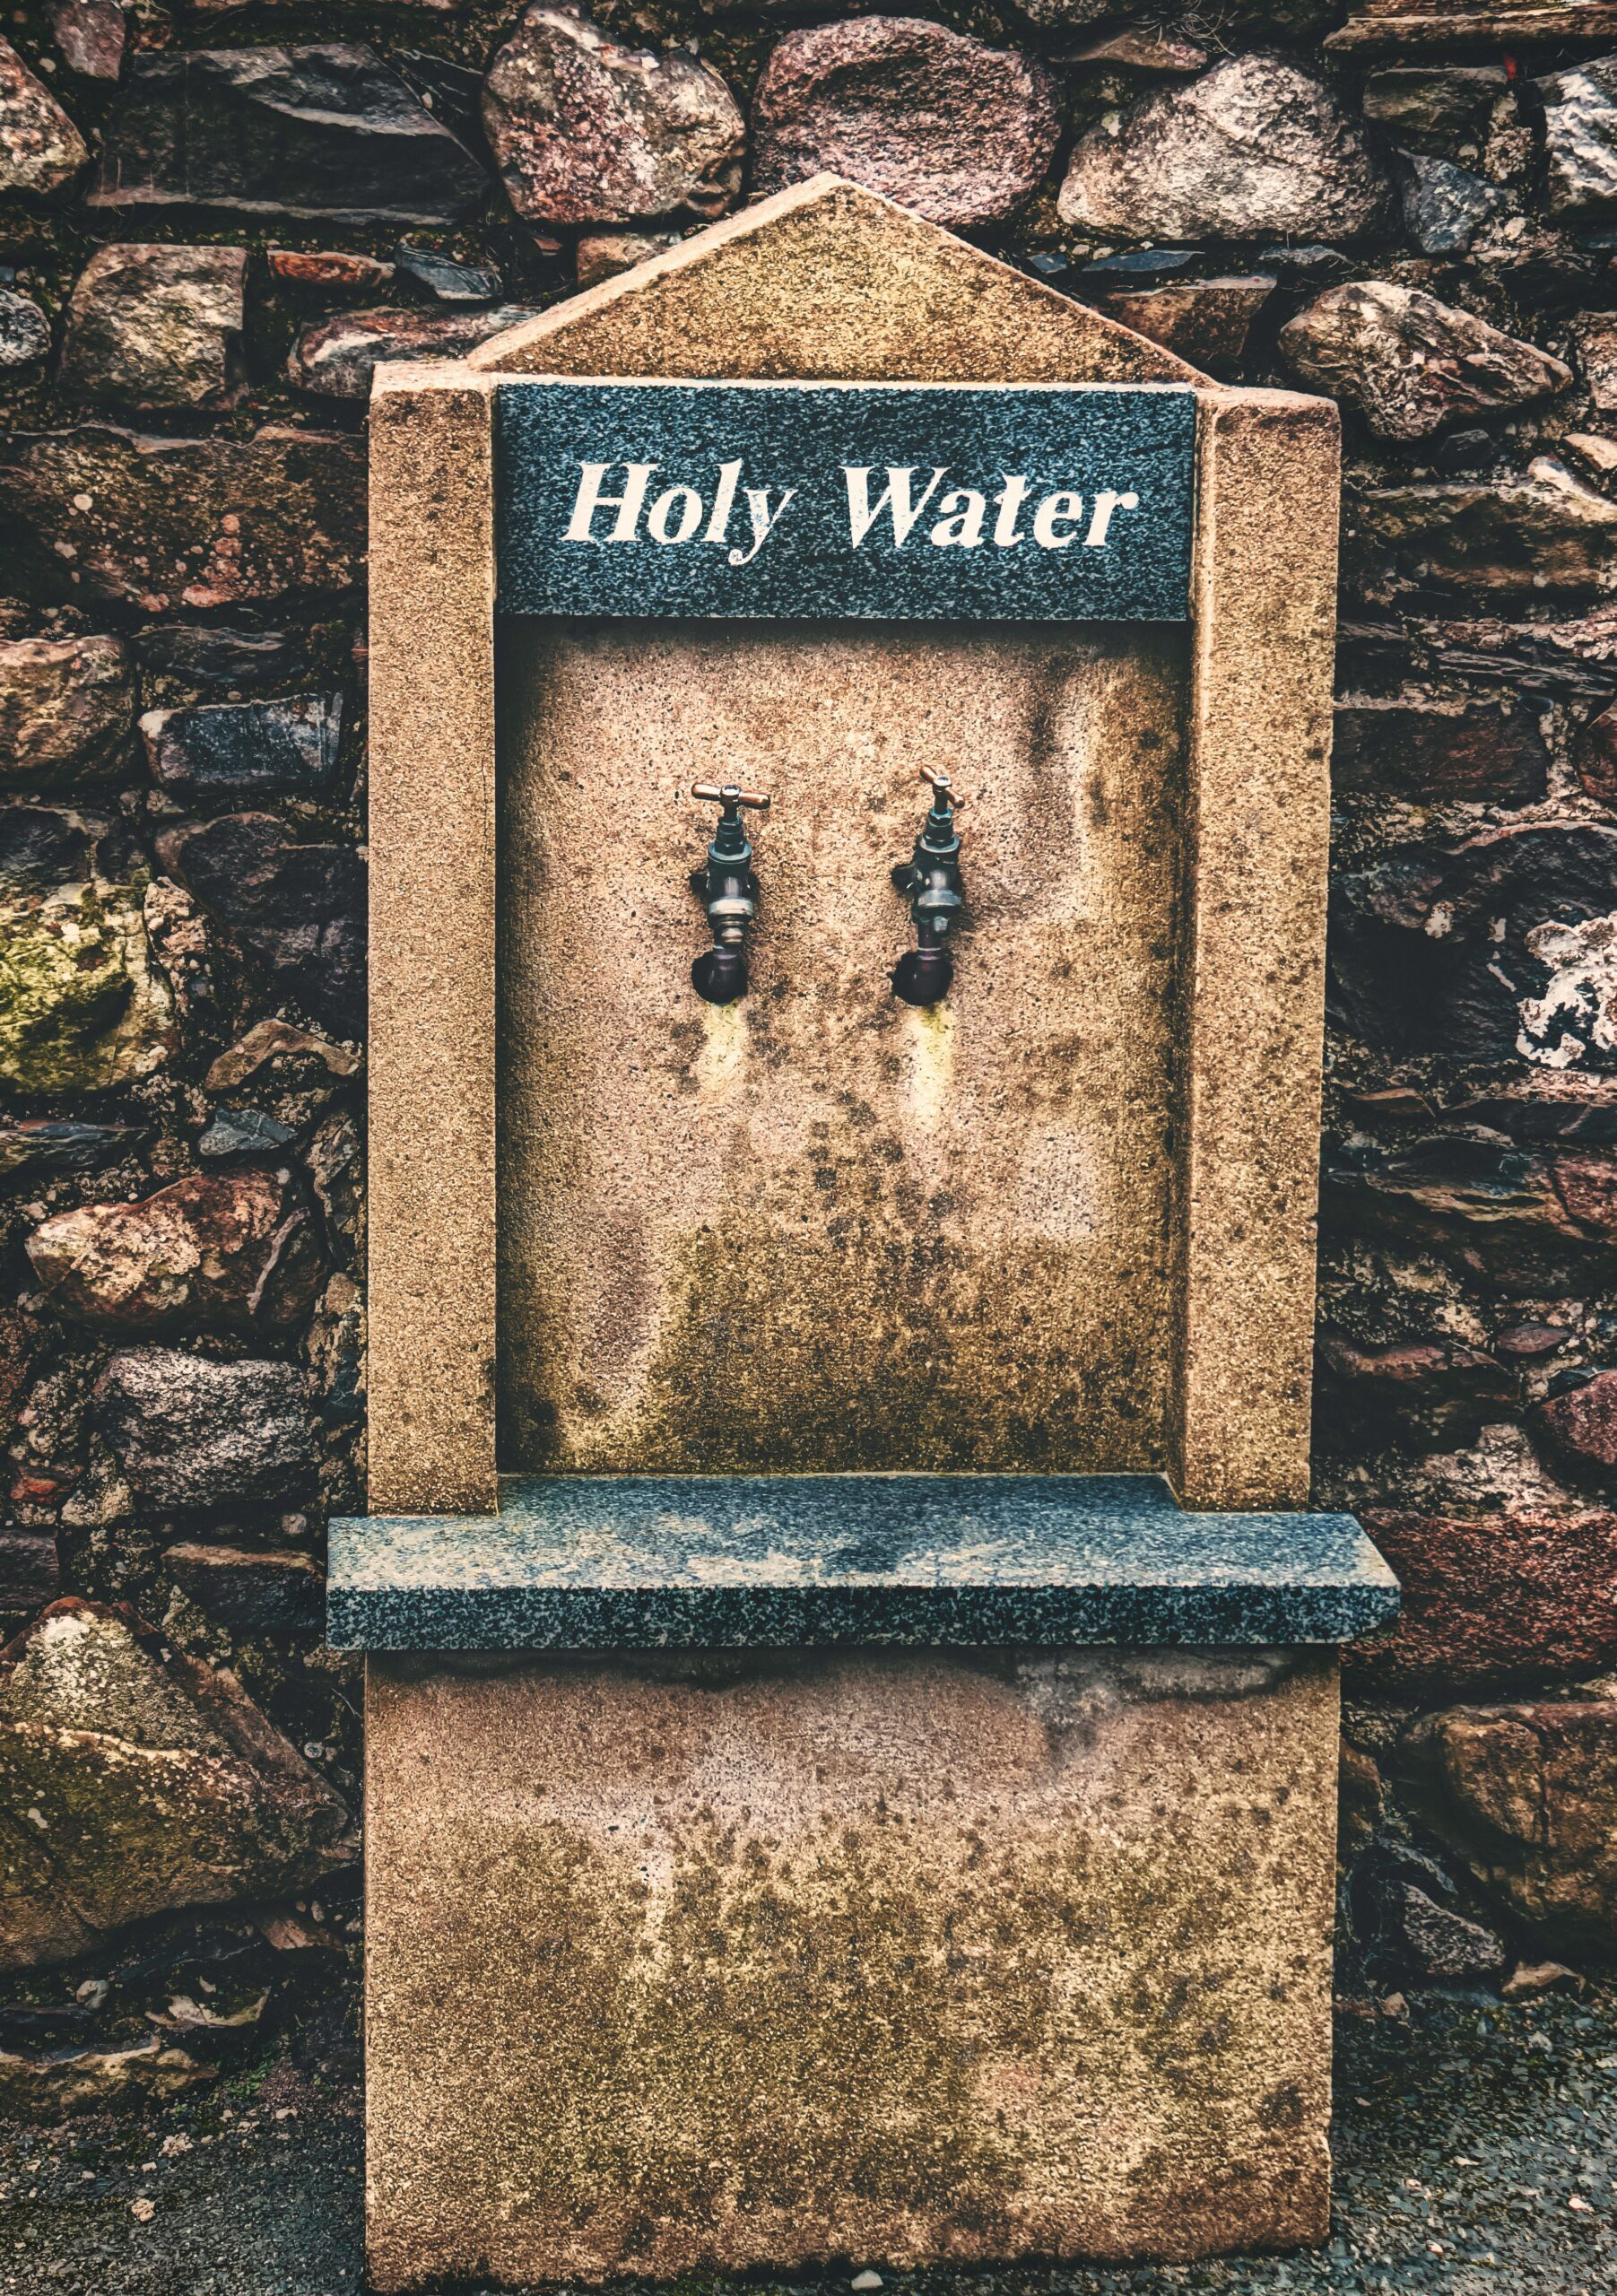 k-mitch-hodge-Holy Water Spigots